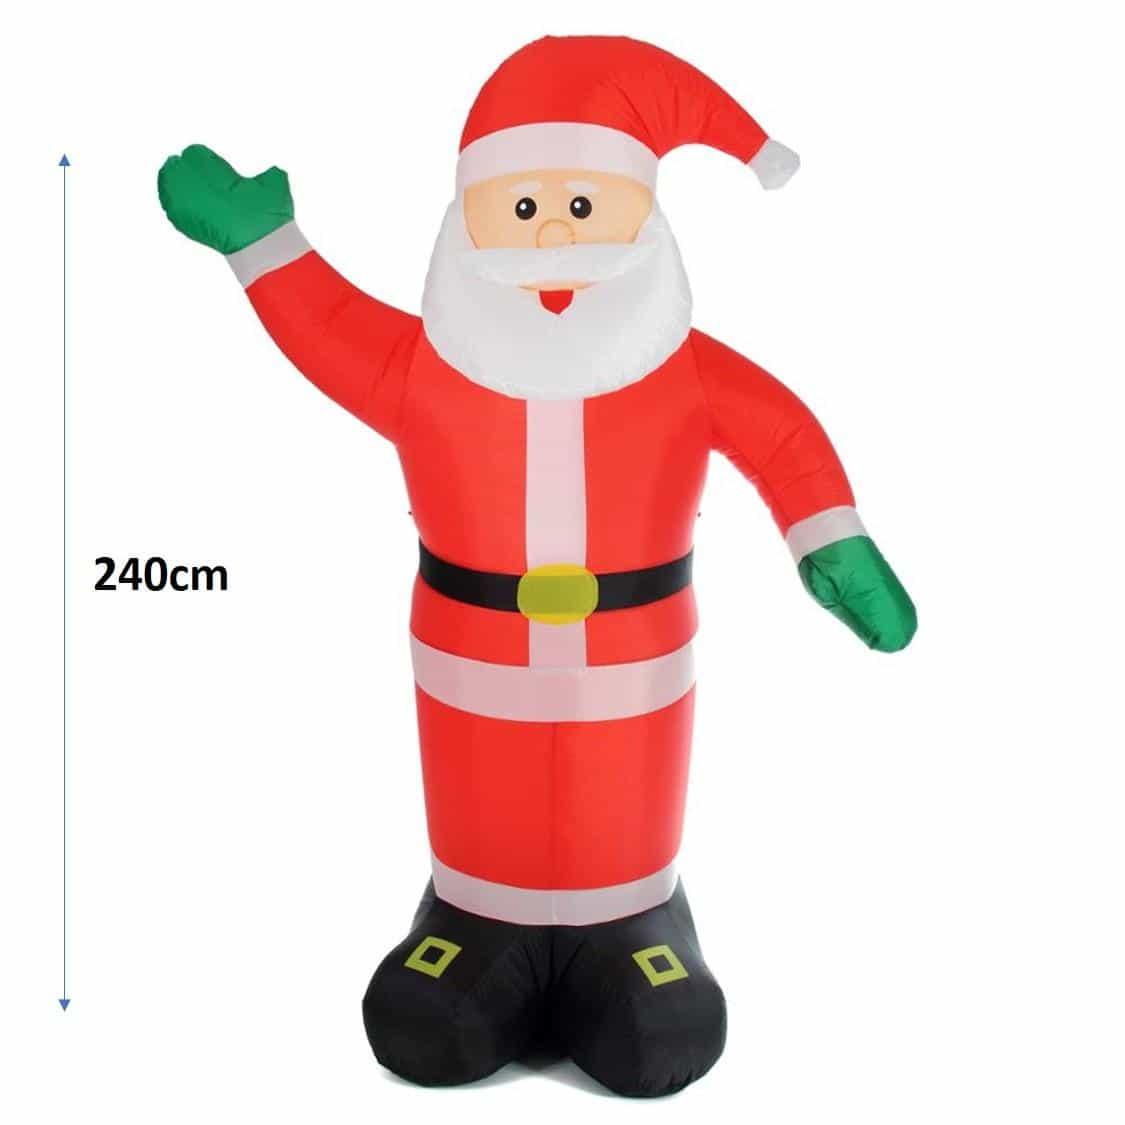 4Goodz opblaasbare kerstman 240cm – LED verlicht – binnen en buiten